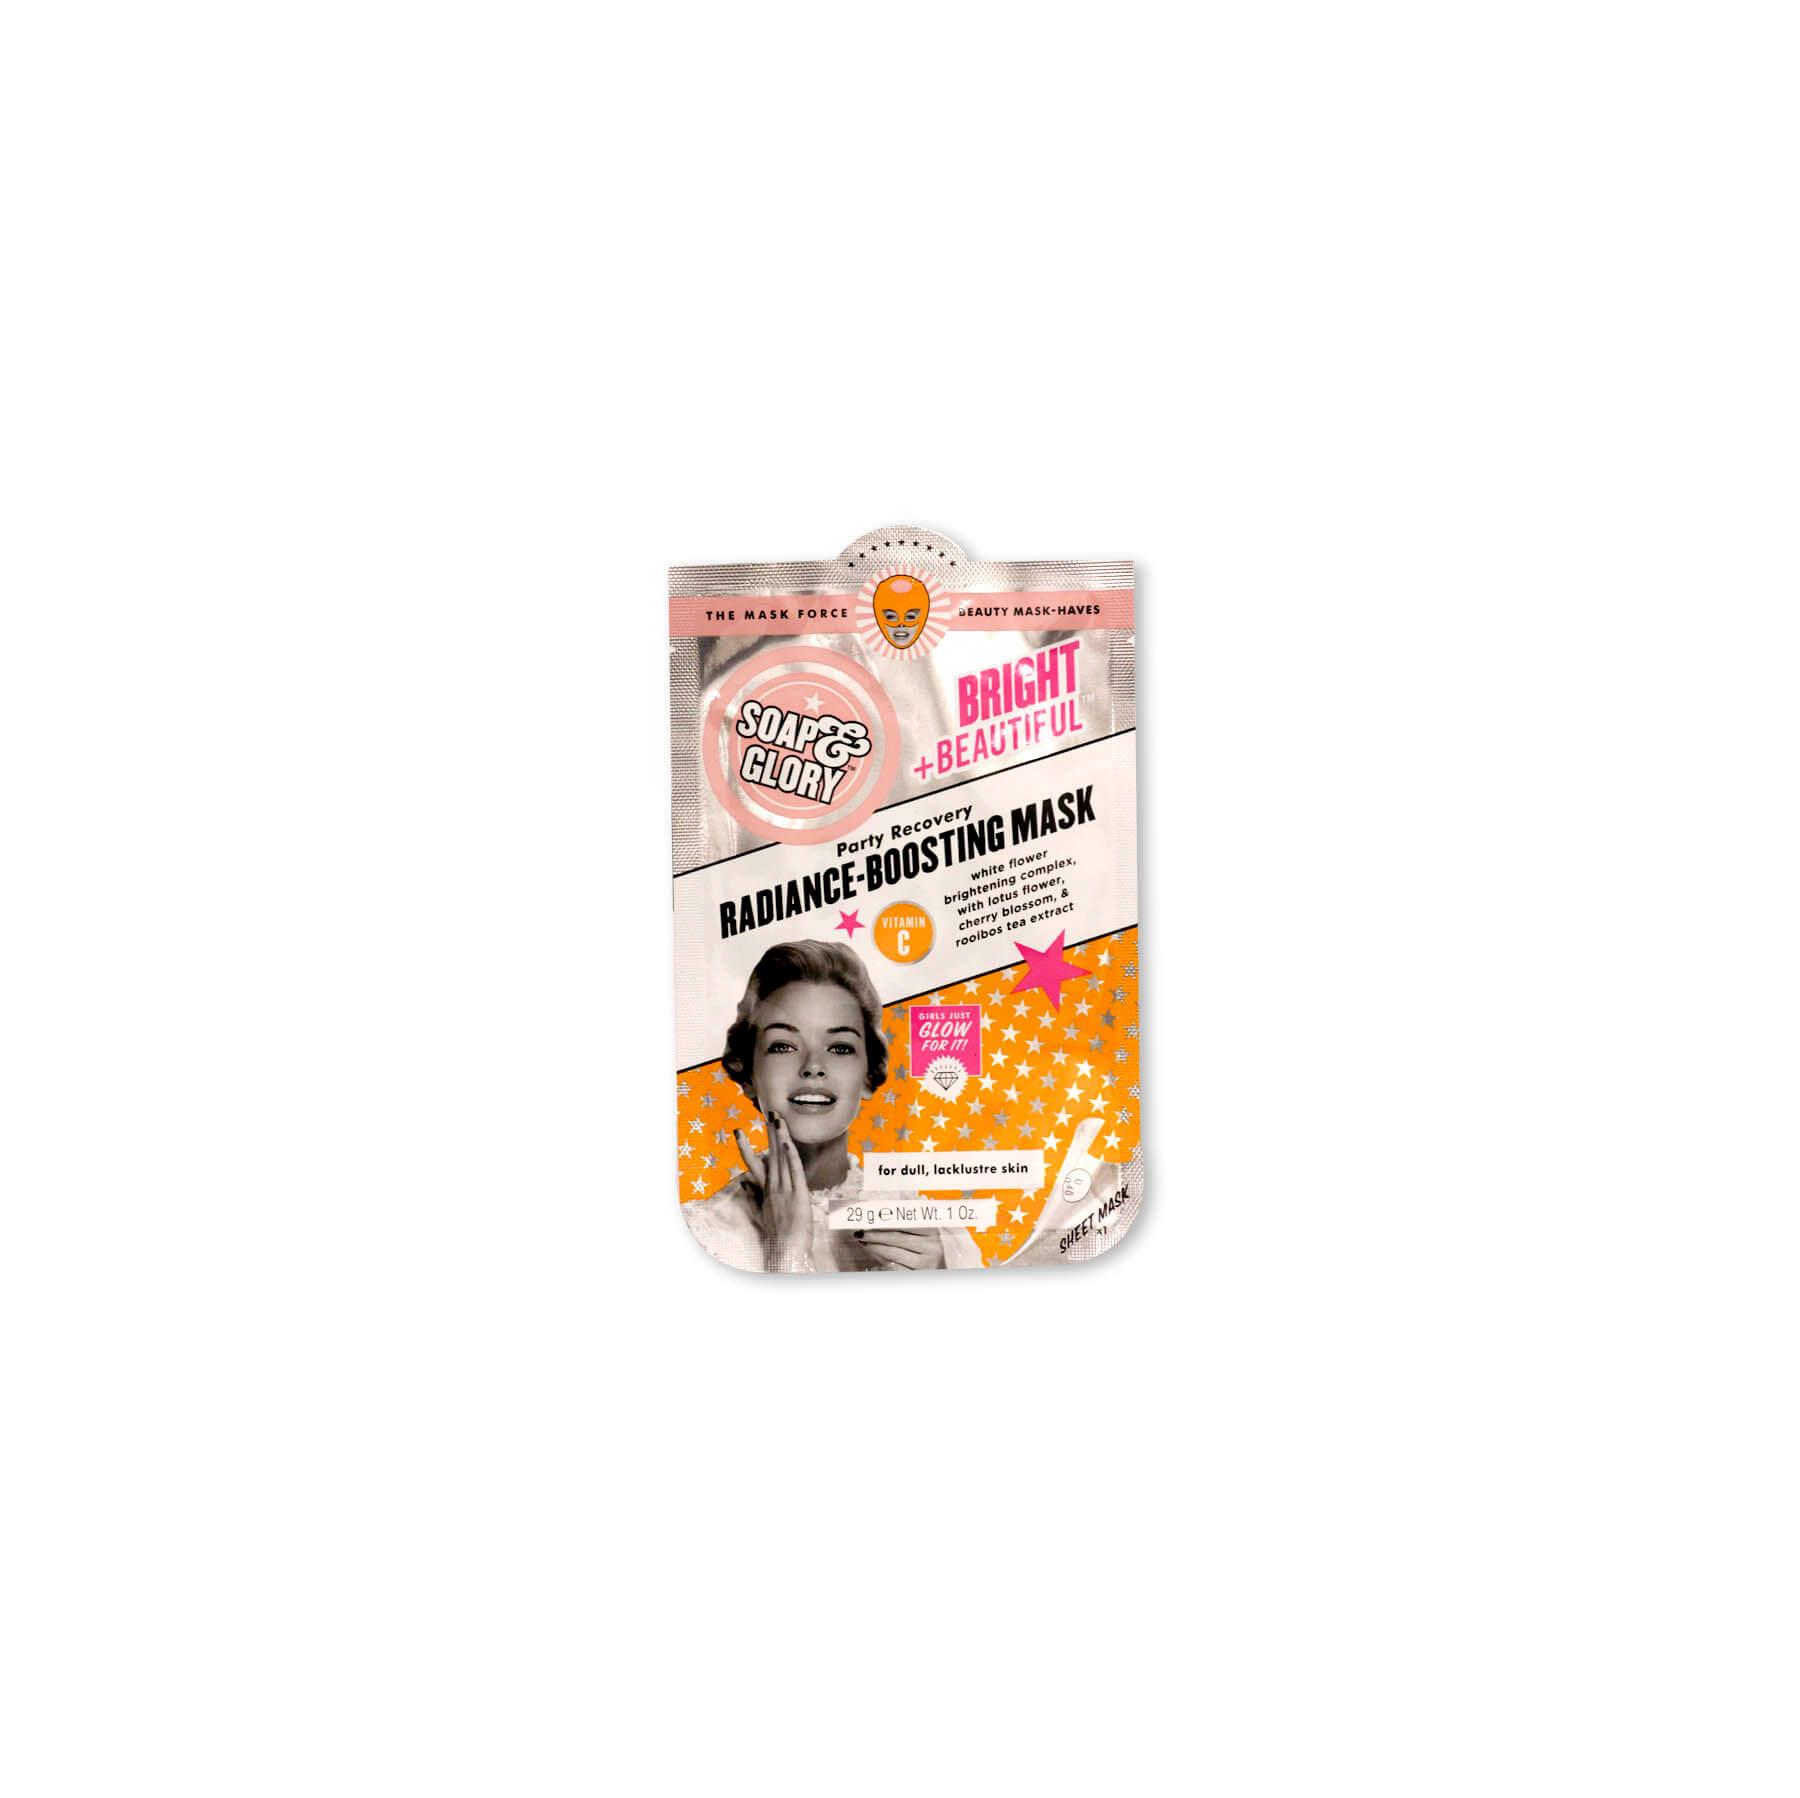 soap & glory mascarilla facial radiance boosting x 1 unidad